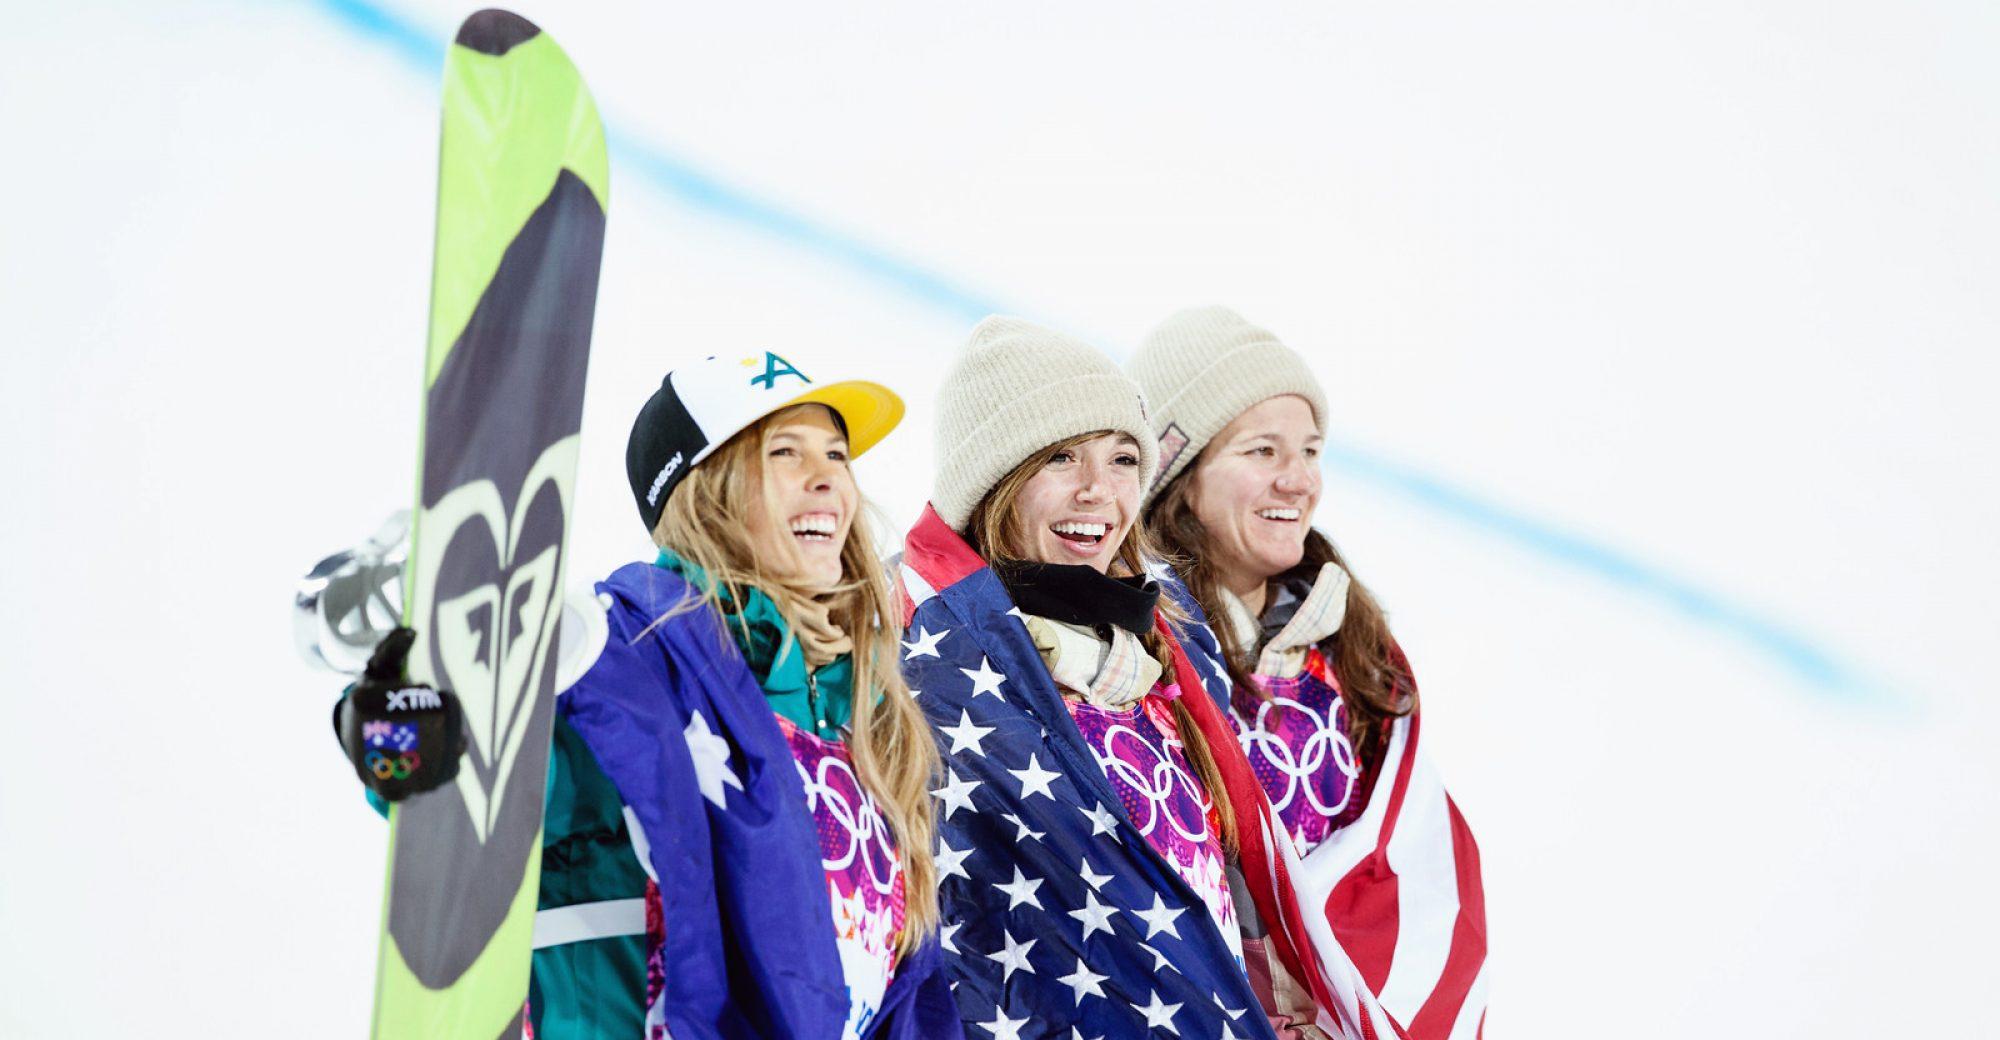 2014 Olympic Winter Games - Sochi, Russia. Women's halfpipe snowboarding Photo: Sarah Brunson/U.S. Snowboarding